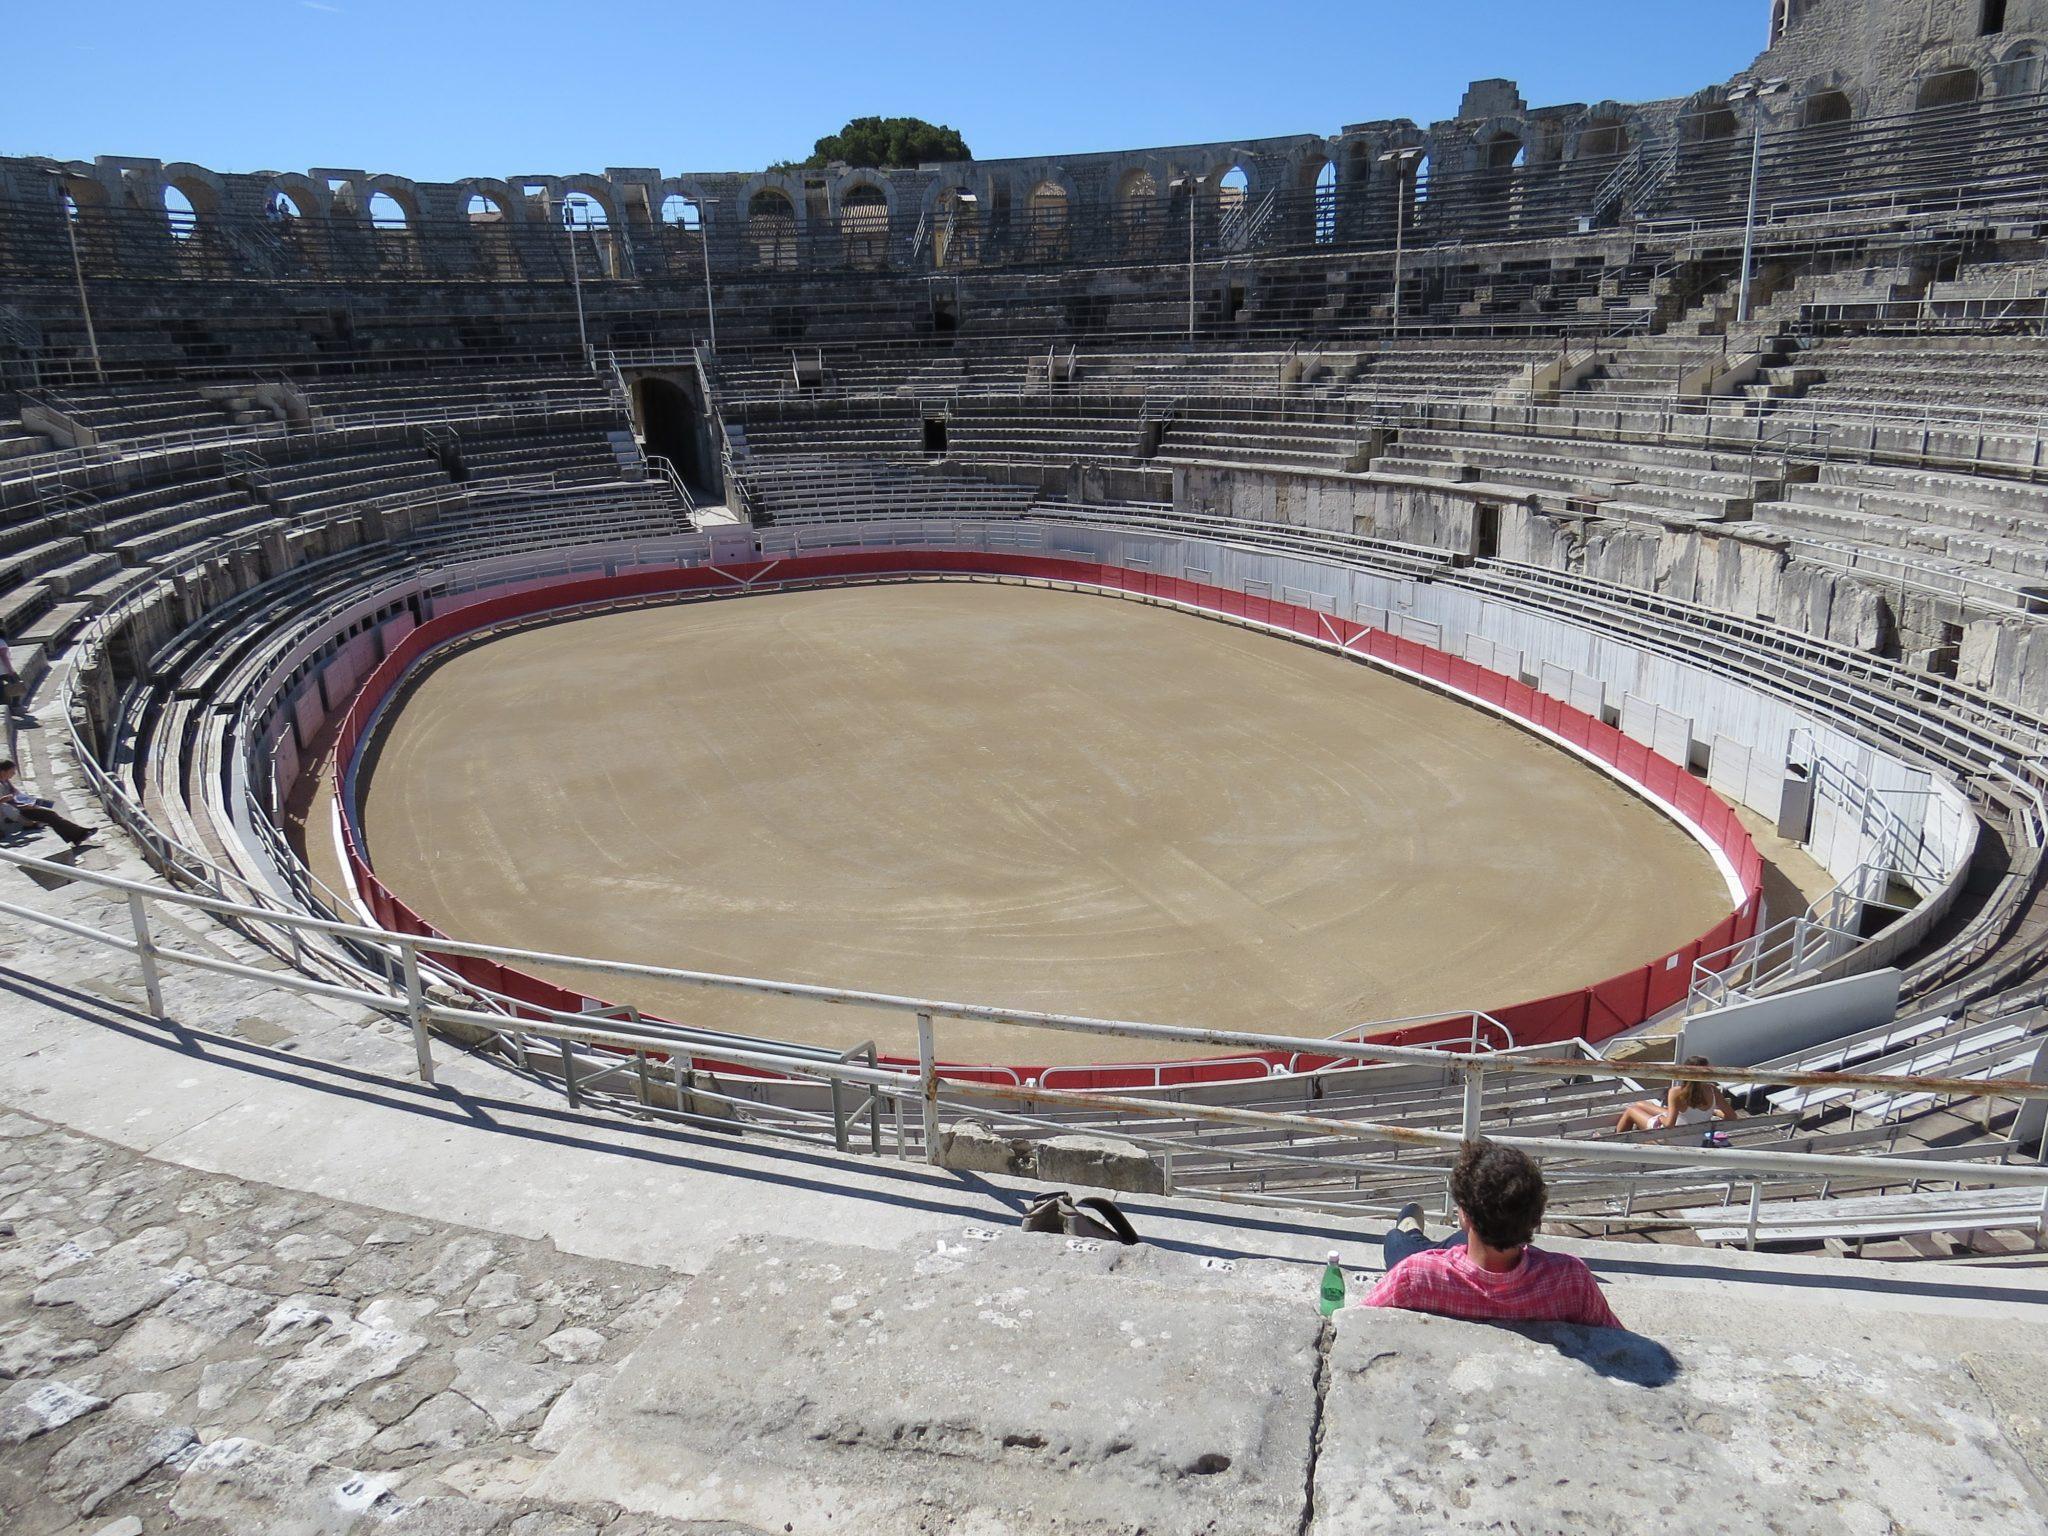 Colosseum at Arles, France